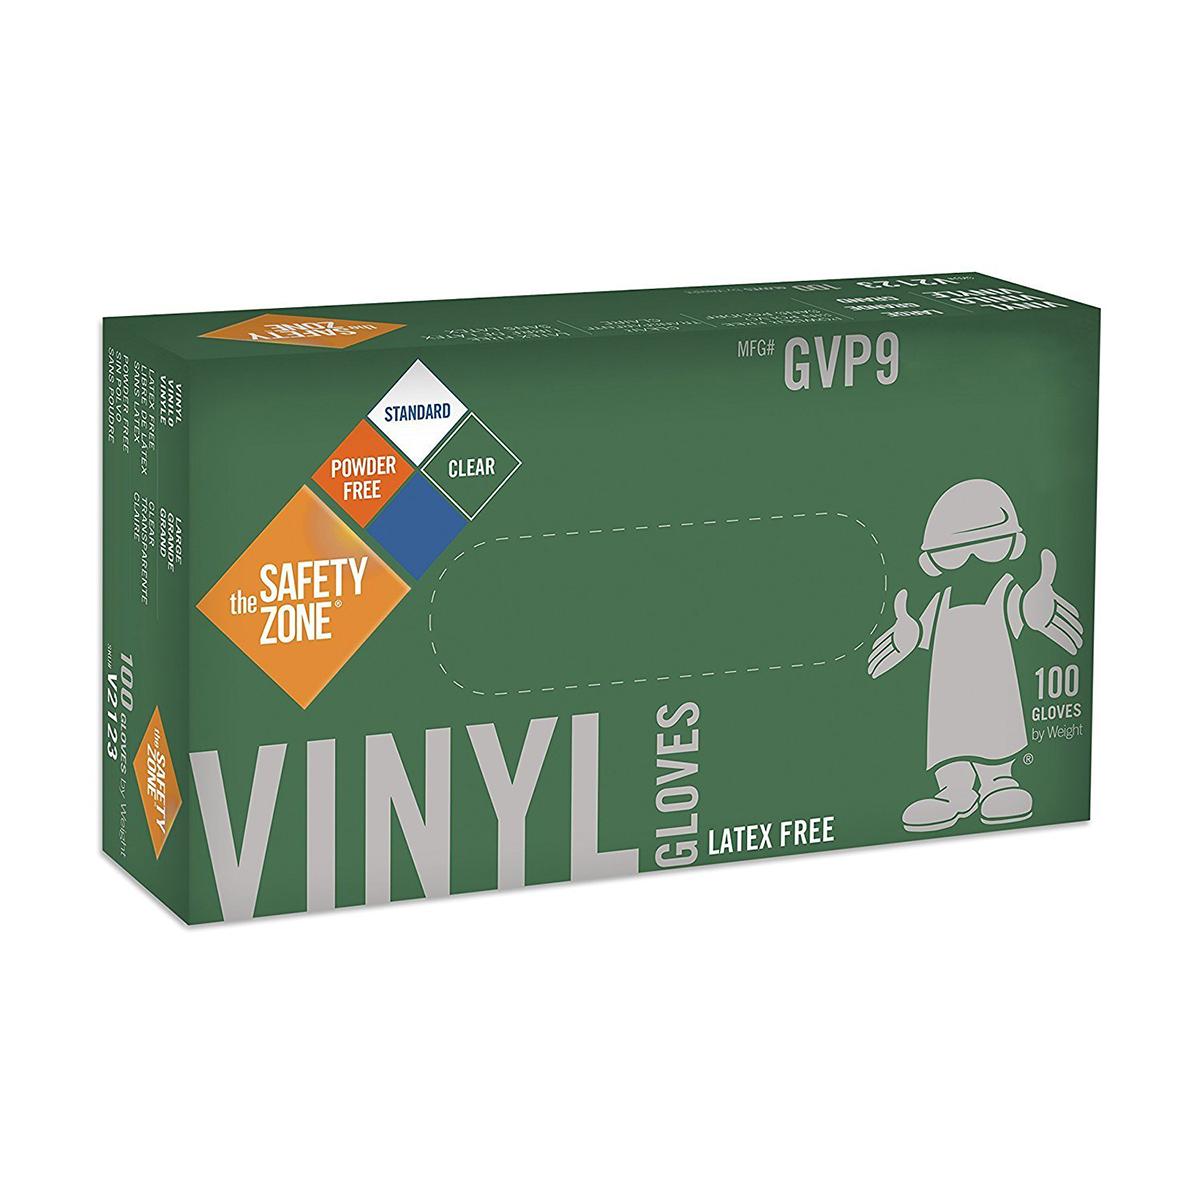 Safety Zone GVP9 Clear Vinyl Gloves, Large, 100/BX